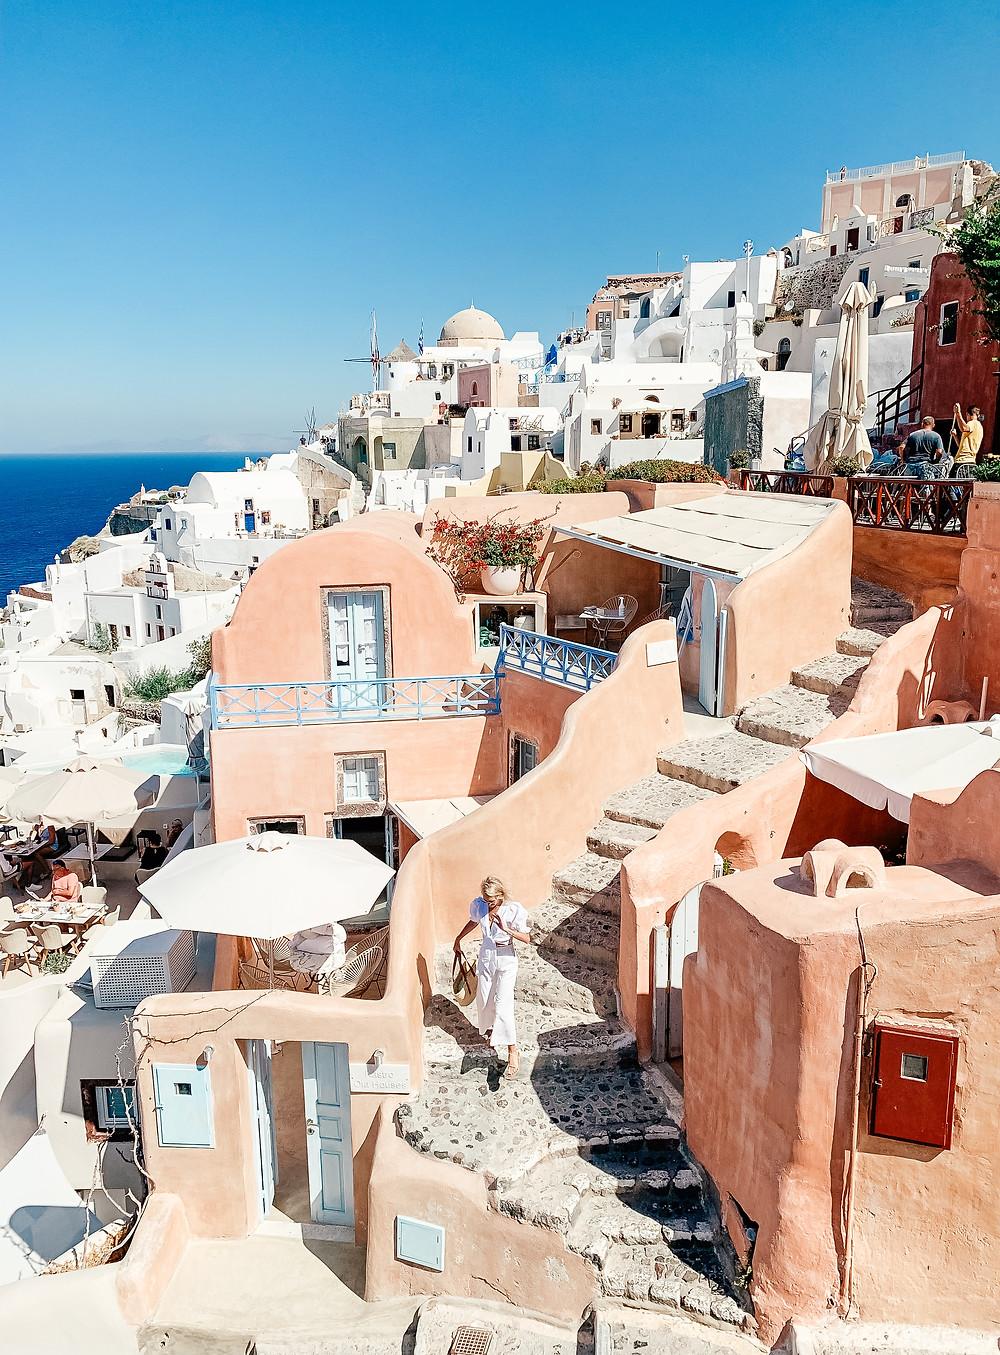 A Guide to Santorini l 4 Days in Santorini l A Style Alike l Travel Guide l Greece